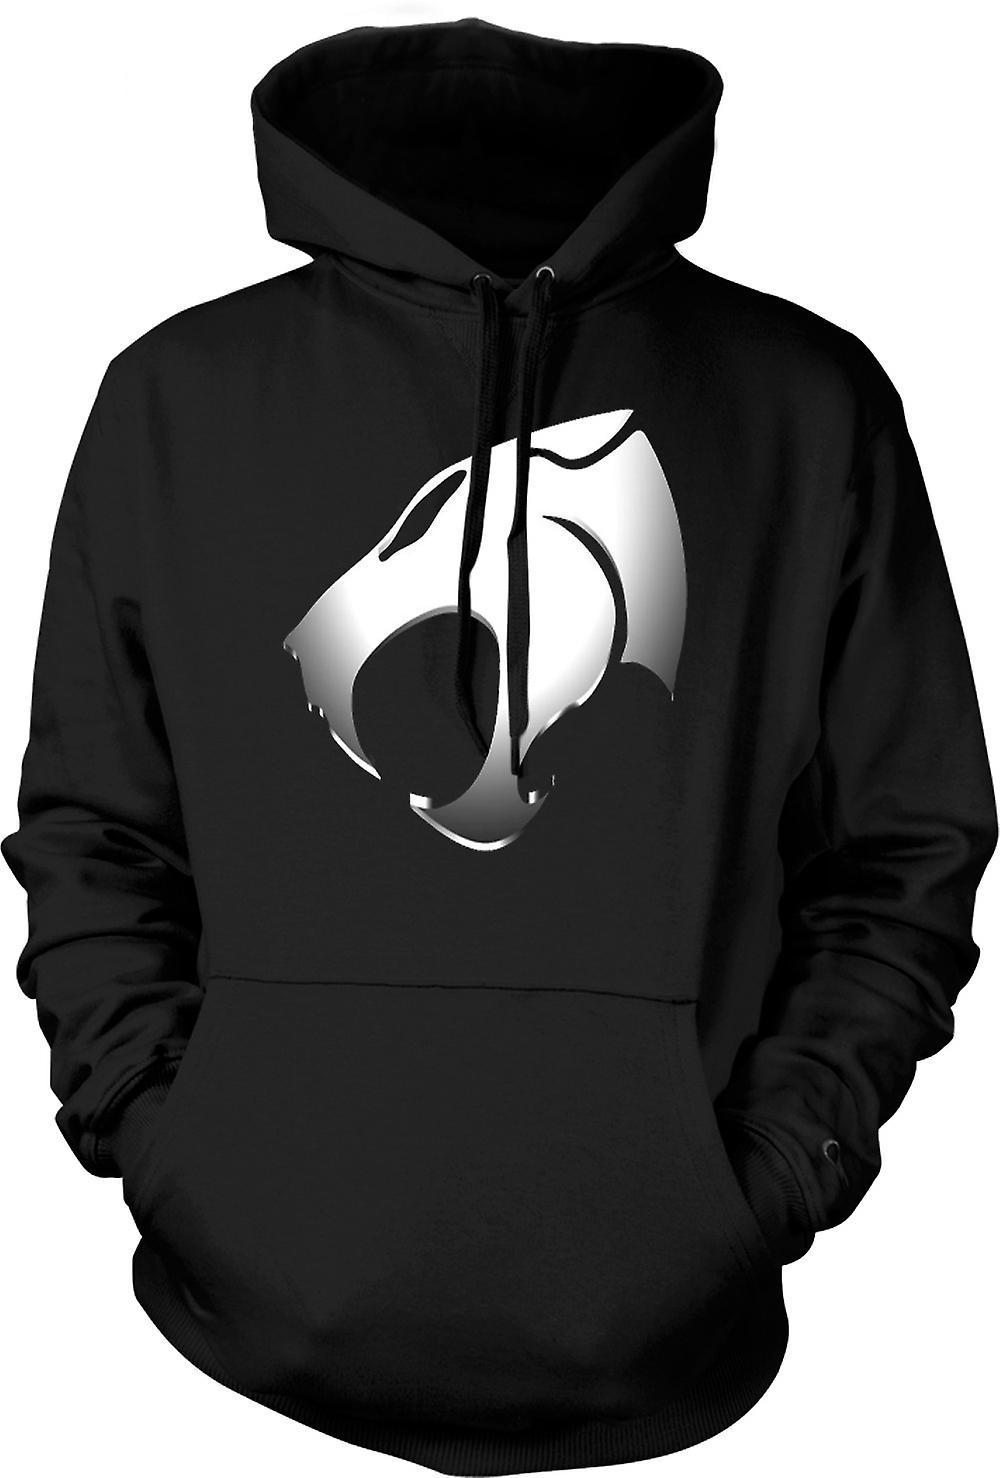 Mens Hoodie - Thundercats - Logo métallique